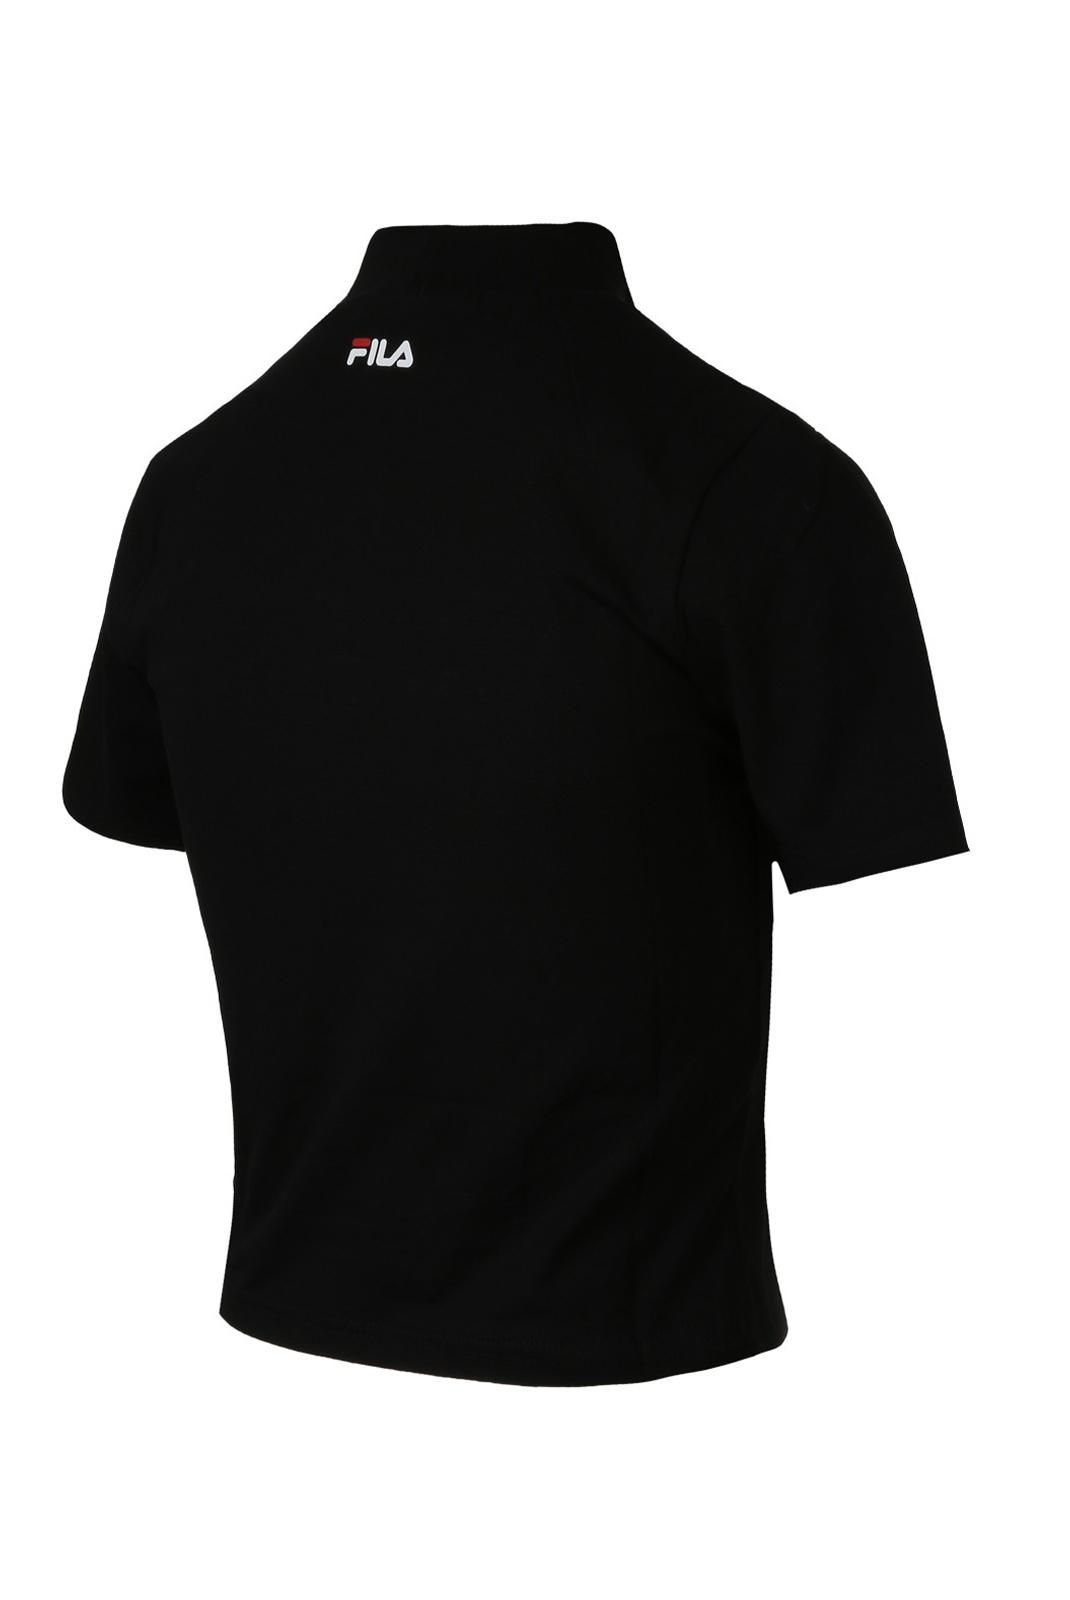 Tee shirt  Fila 681267 every 2 BLACK